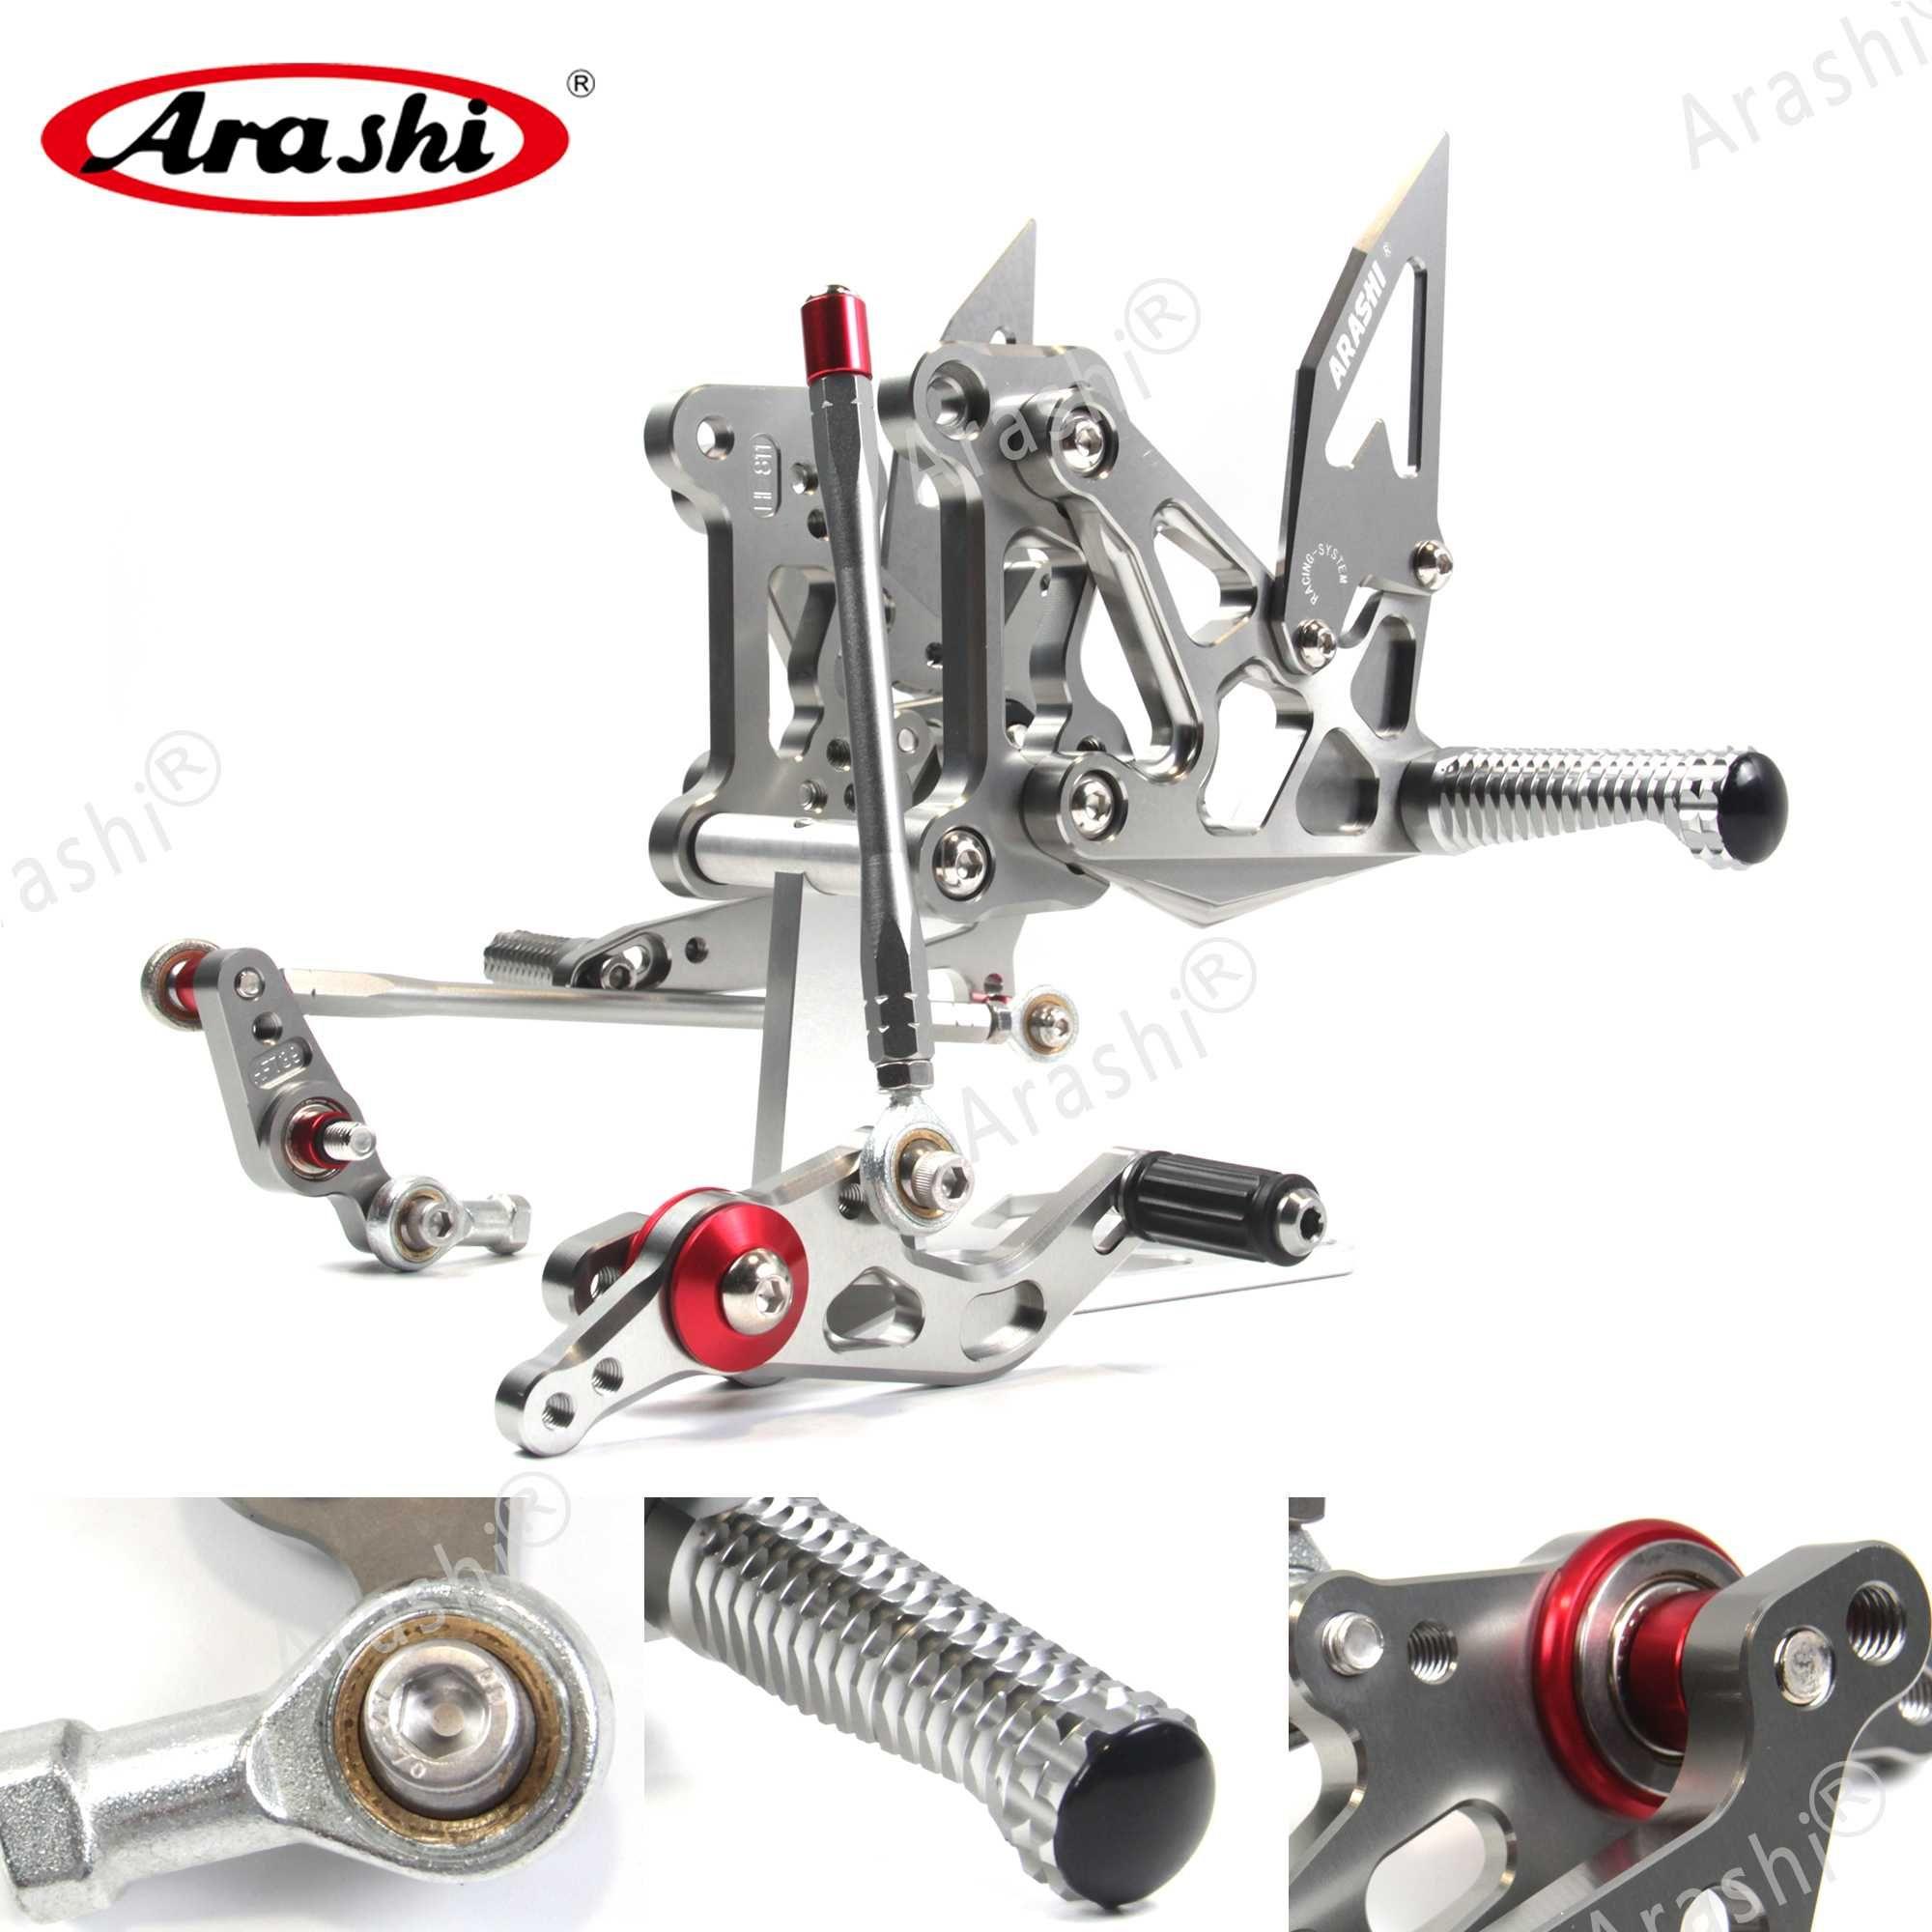 Arashi New Для MV Agusta Brutale 675 800 Dragster / F3 675 2012 2013 2014 2015 Регулируемой Подножка Подножка Rider Rearset